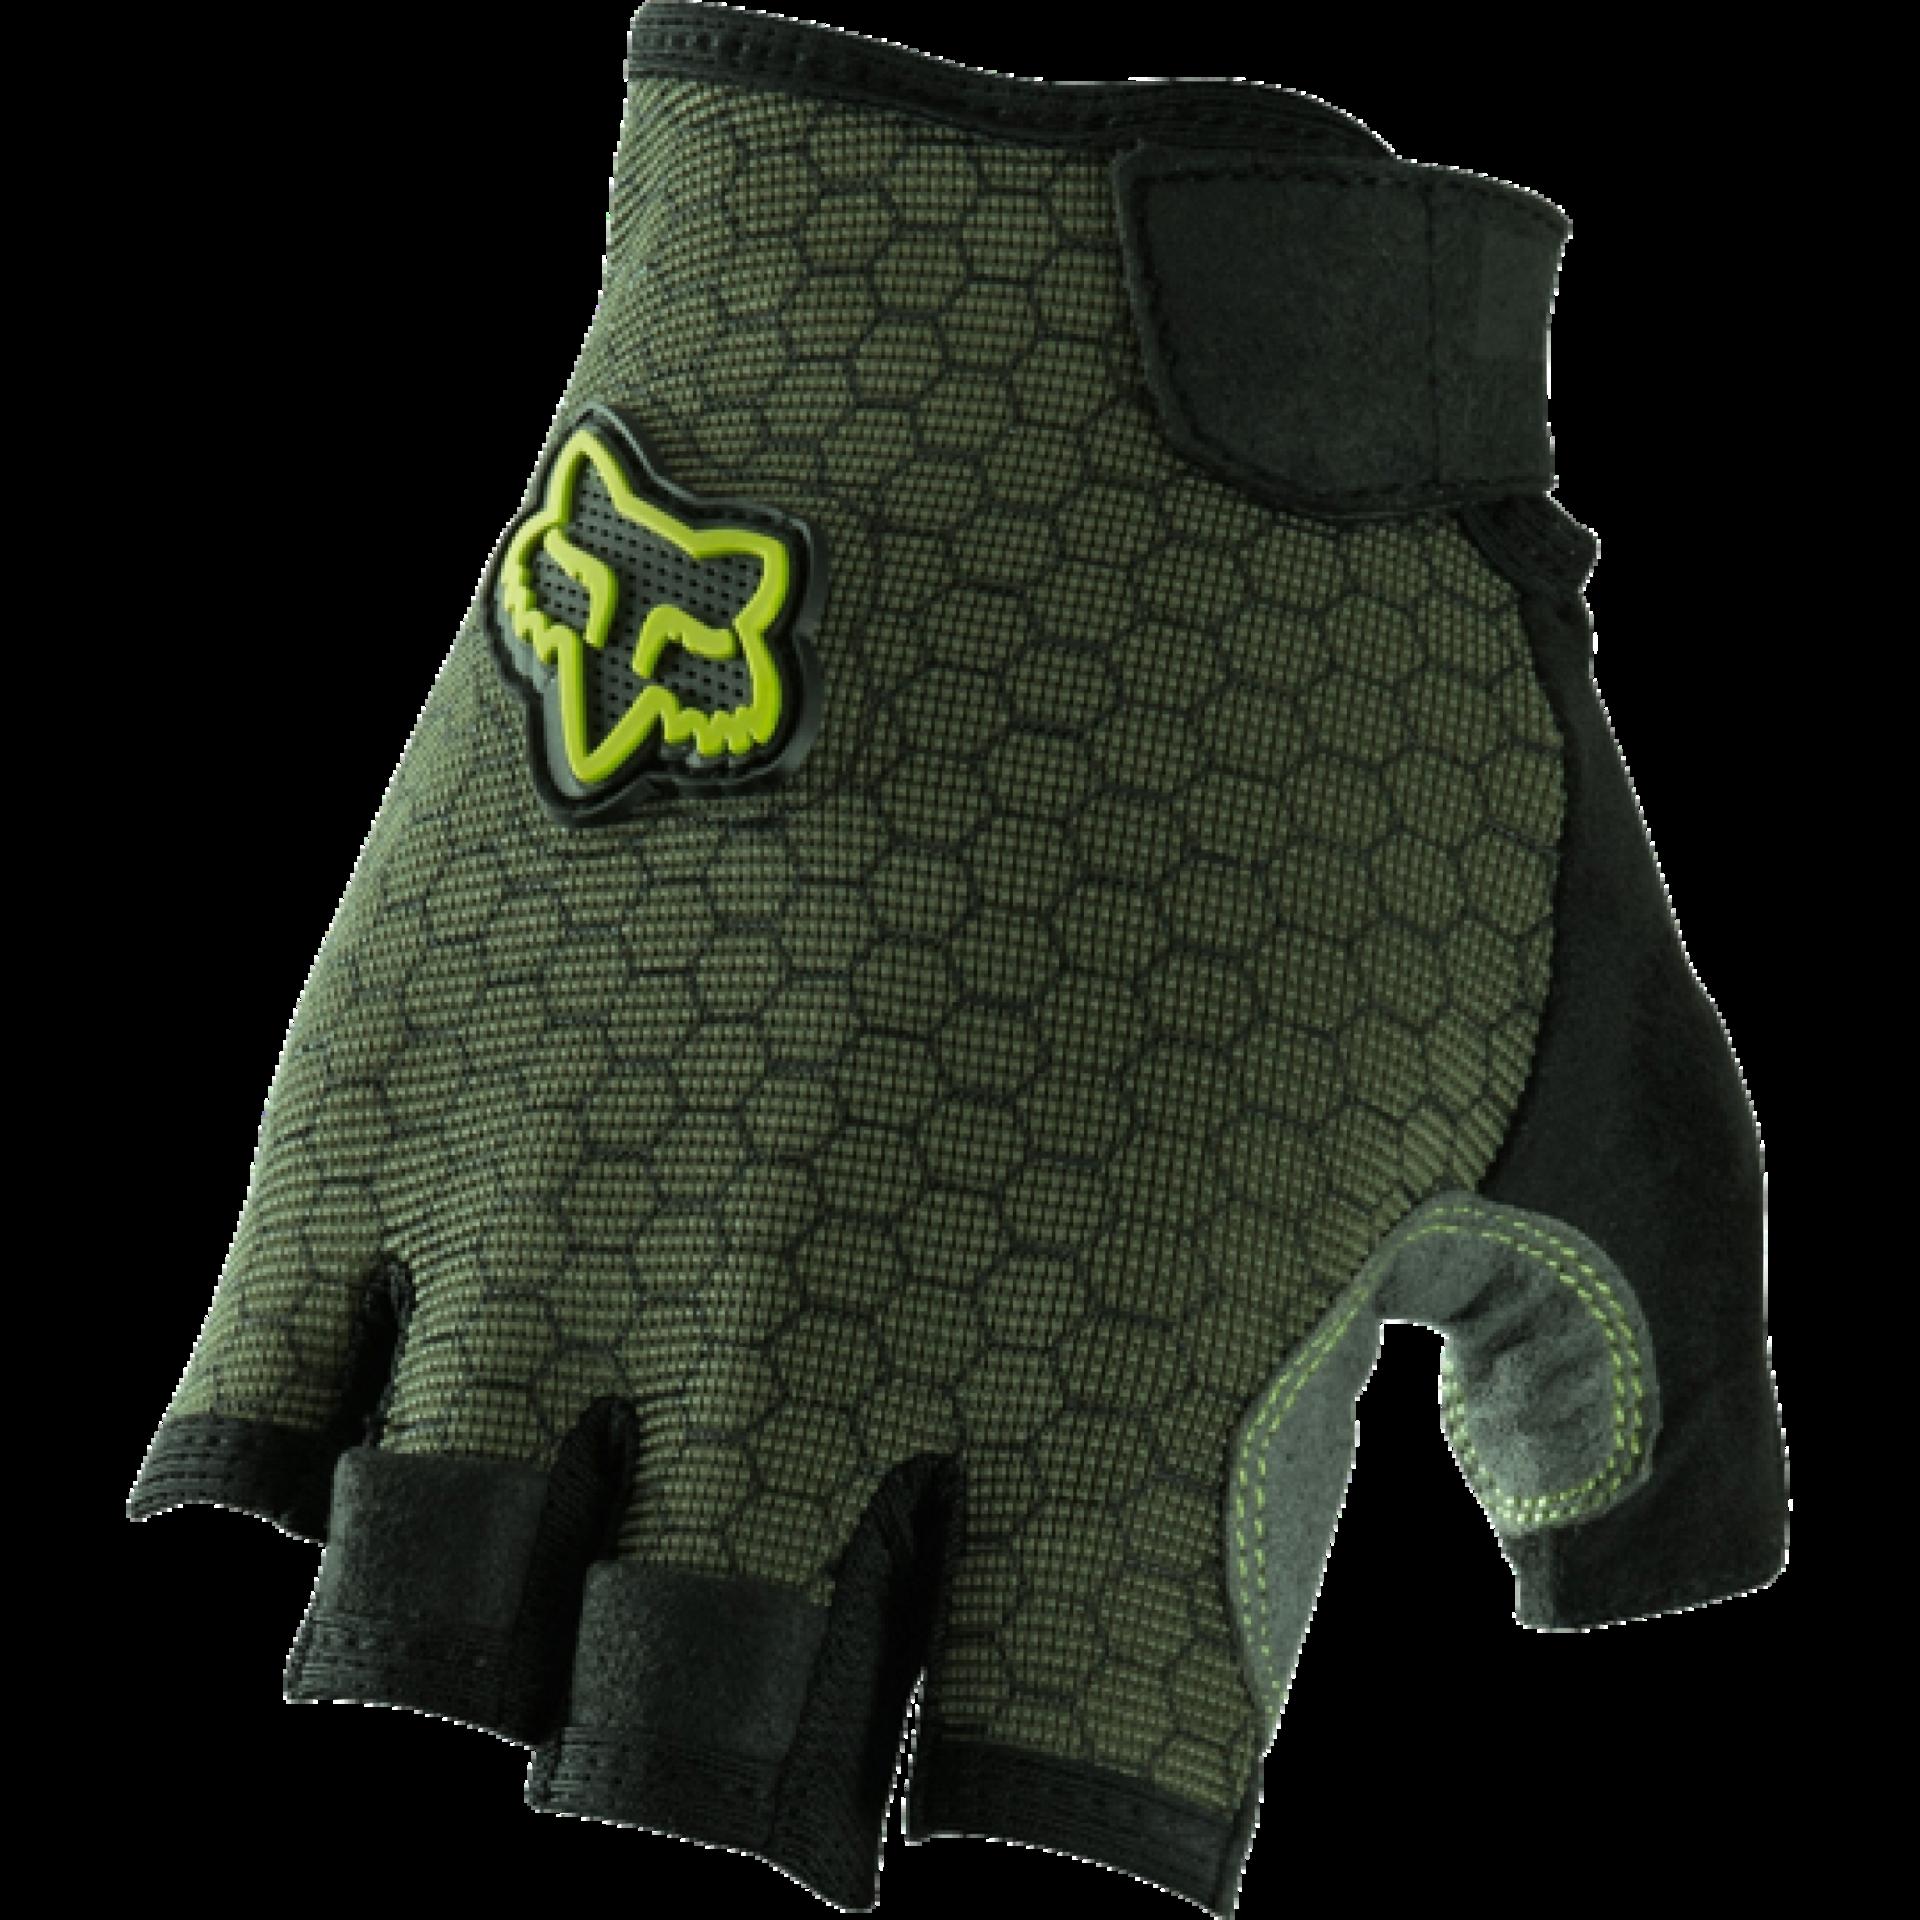 Rekawiczki rowerowe Foxhead Ranger short glove zielone góra